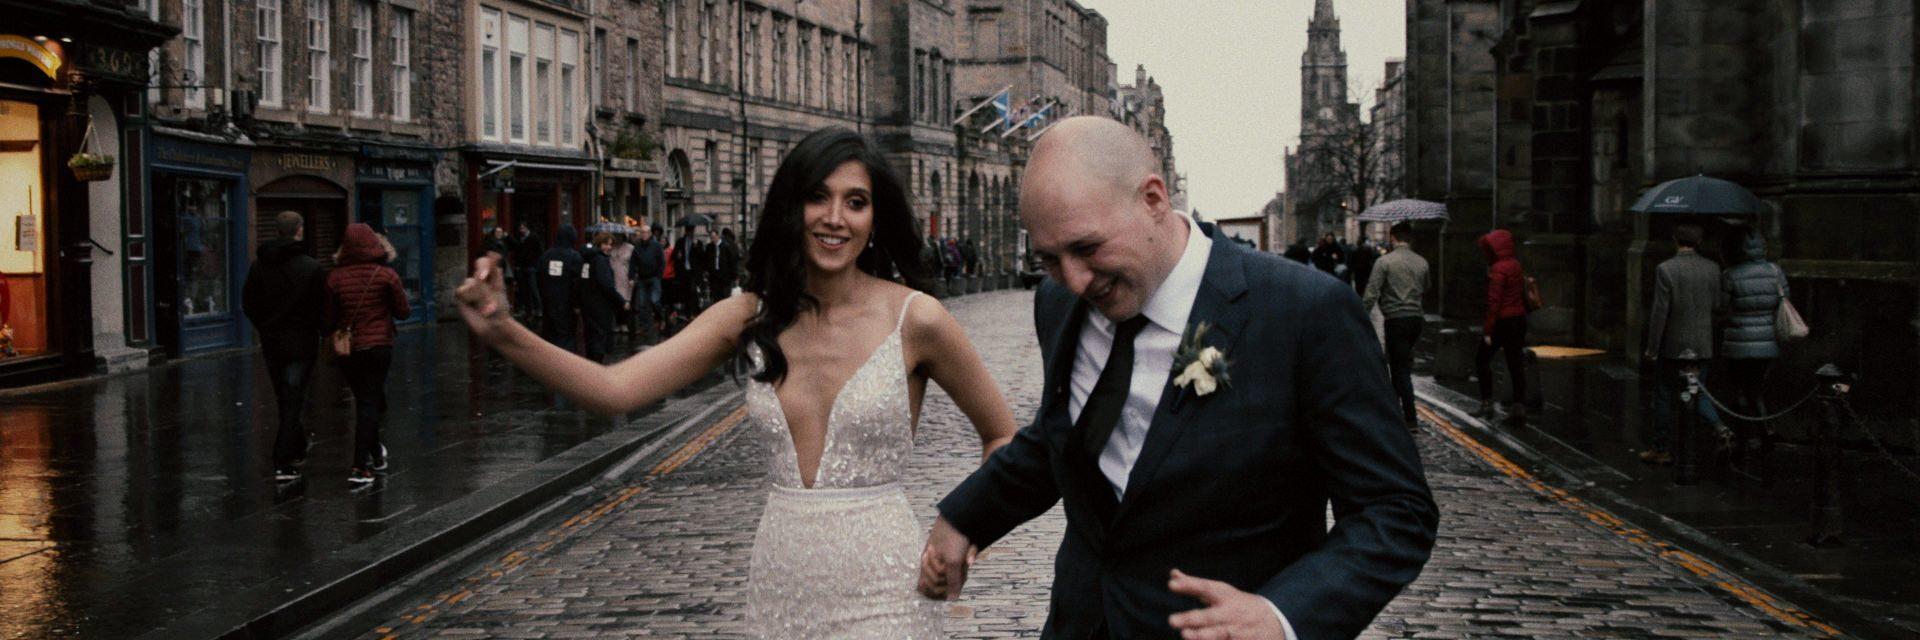 Perugia-wedding-videographer-cinemate-films-04